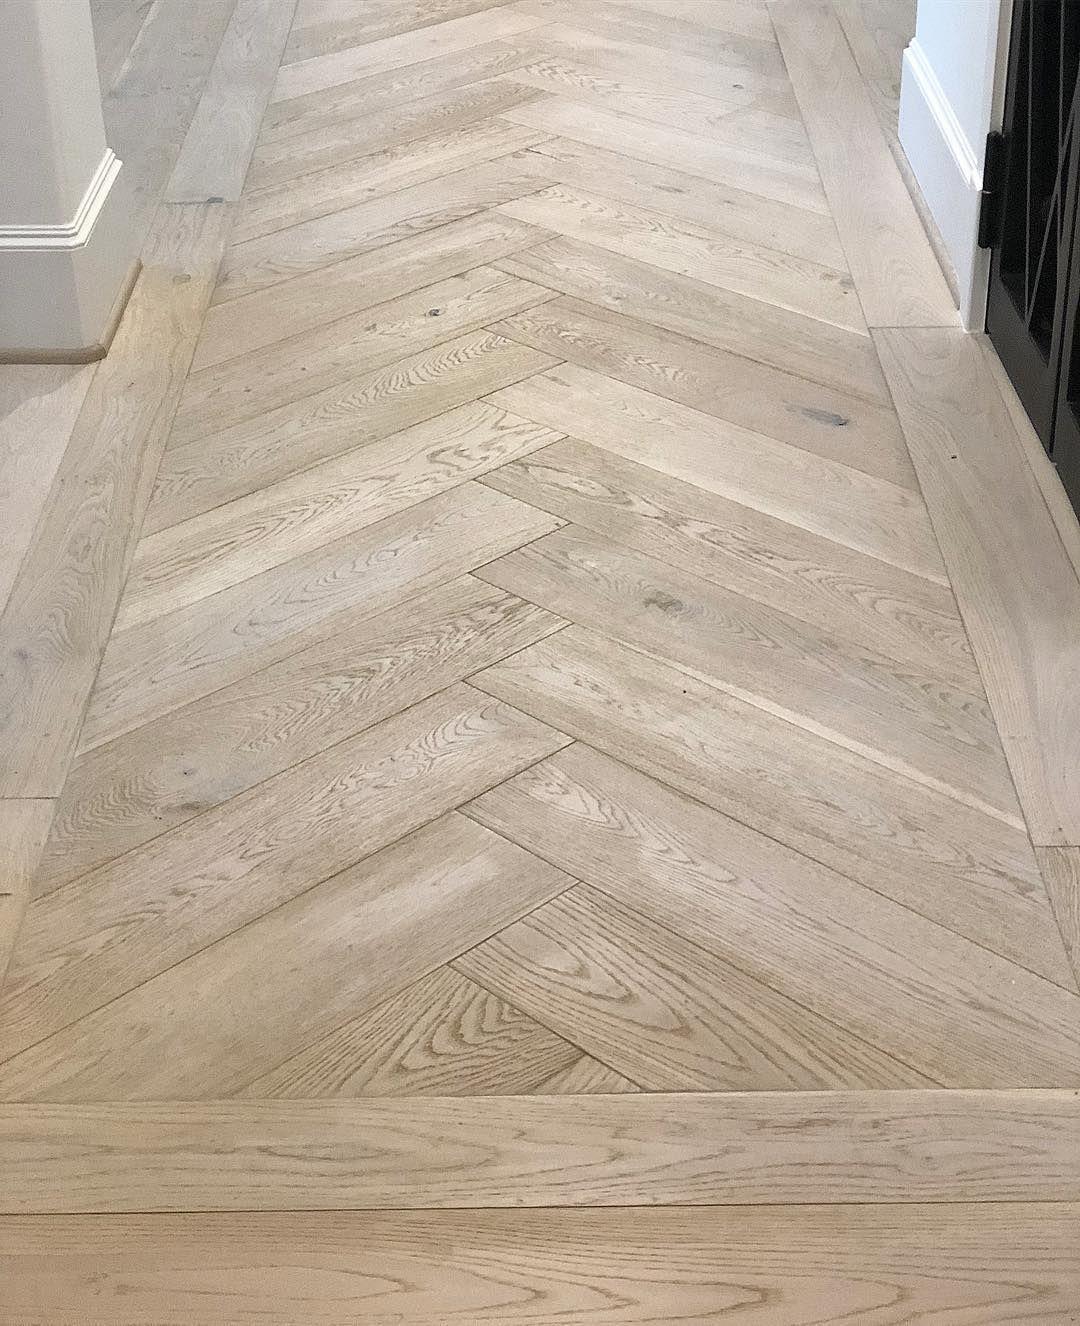 Hallmark Floors On Instagram How About Herringbone In Your Entryway This Top Notch Installation Elevates T In 2020 Herringbone Wood Floor Wood Floor Design Flooring